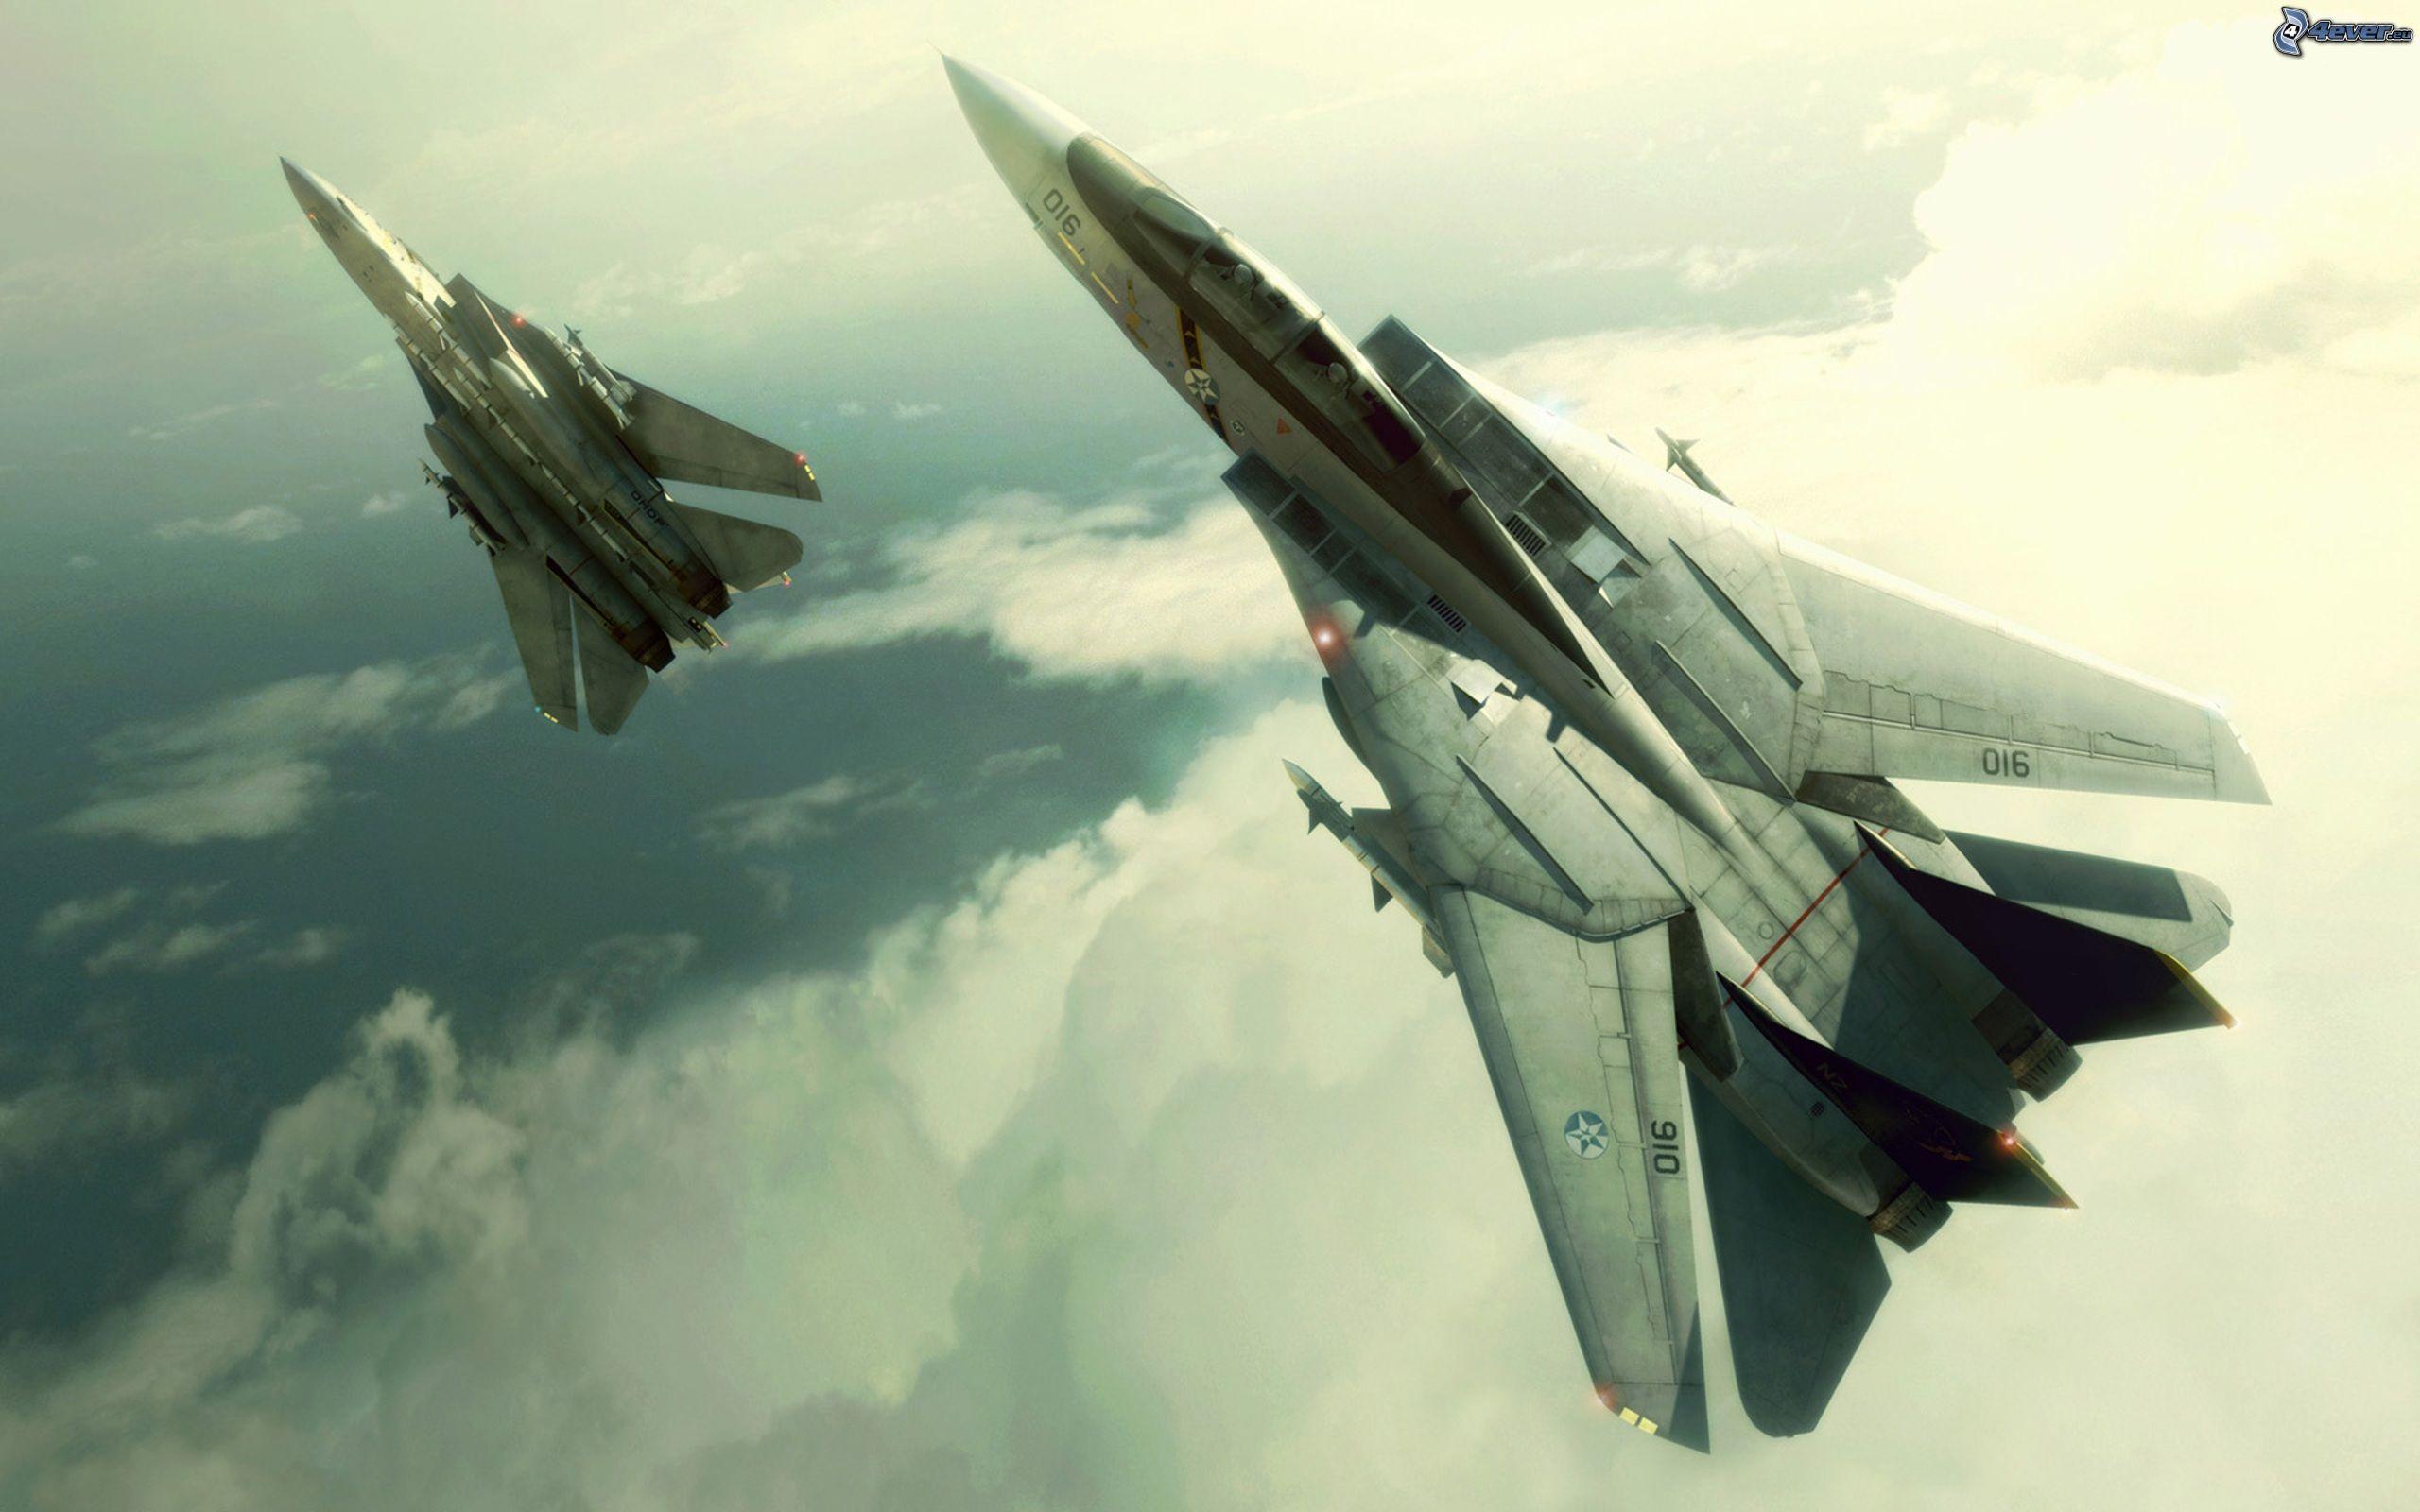 14 tomcat jet fighter - photo #11